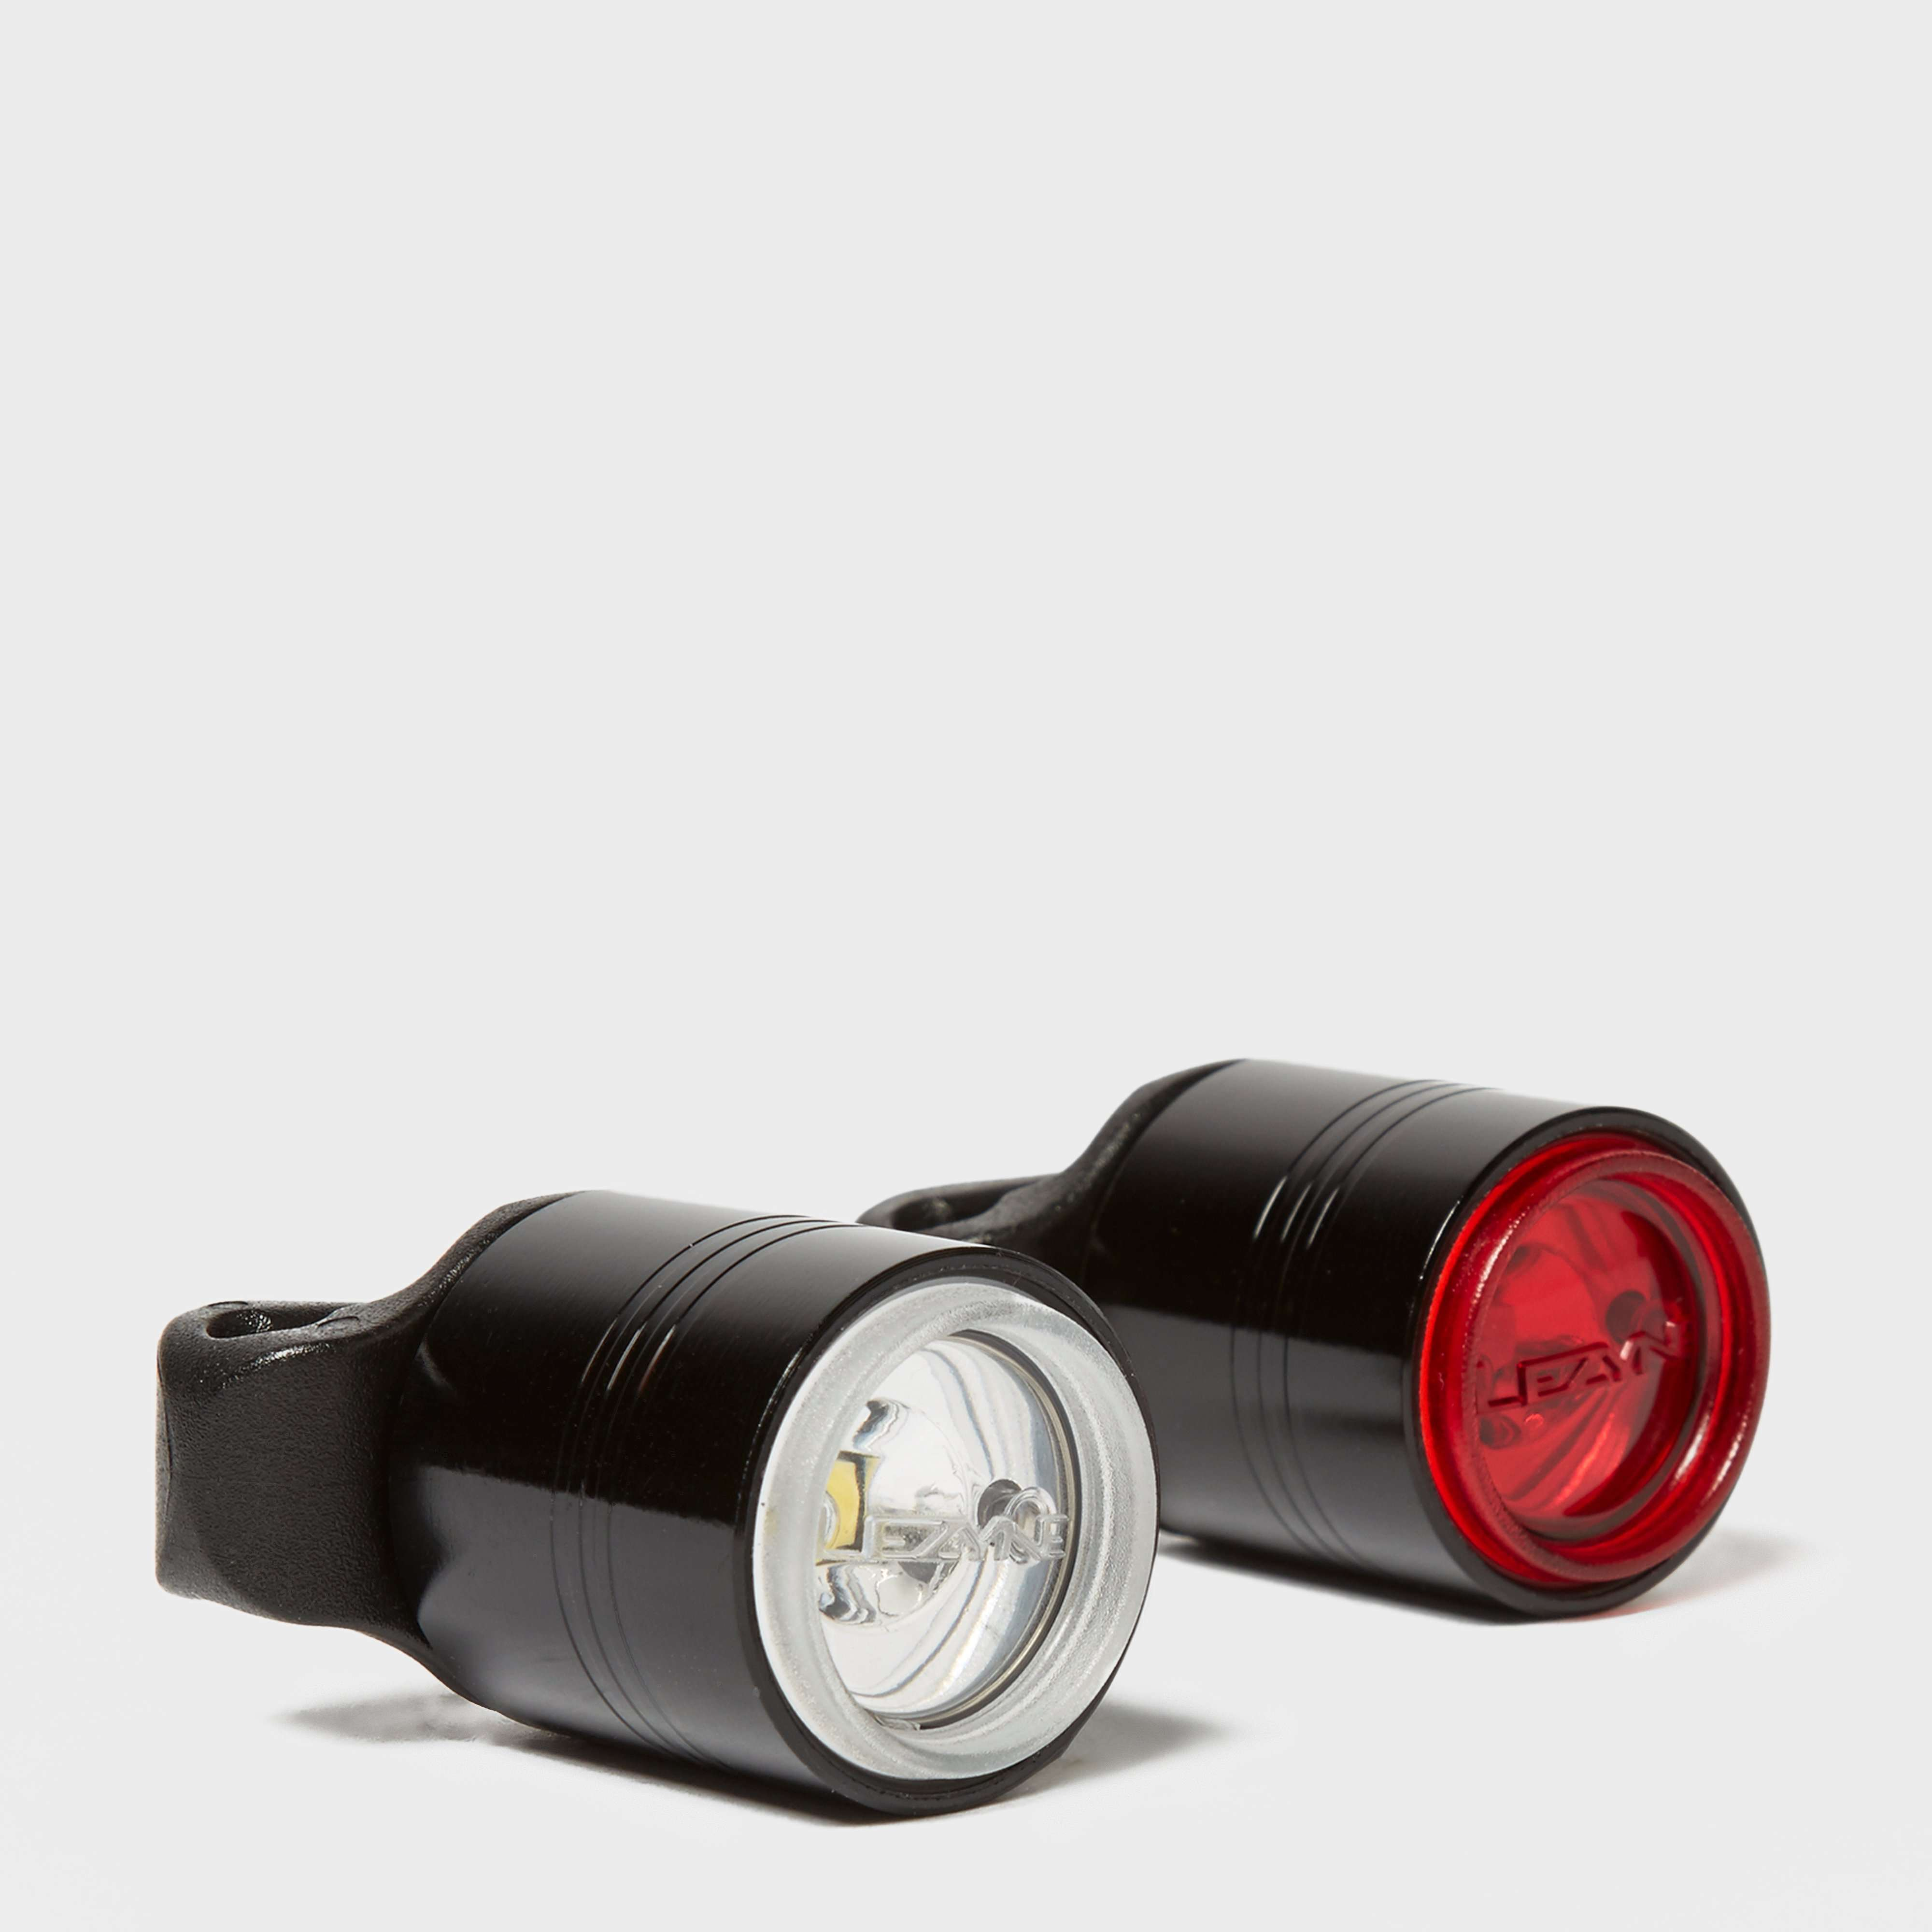 LEZYNE LED Femto Cycling Light - Pair